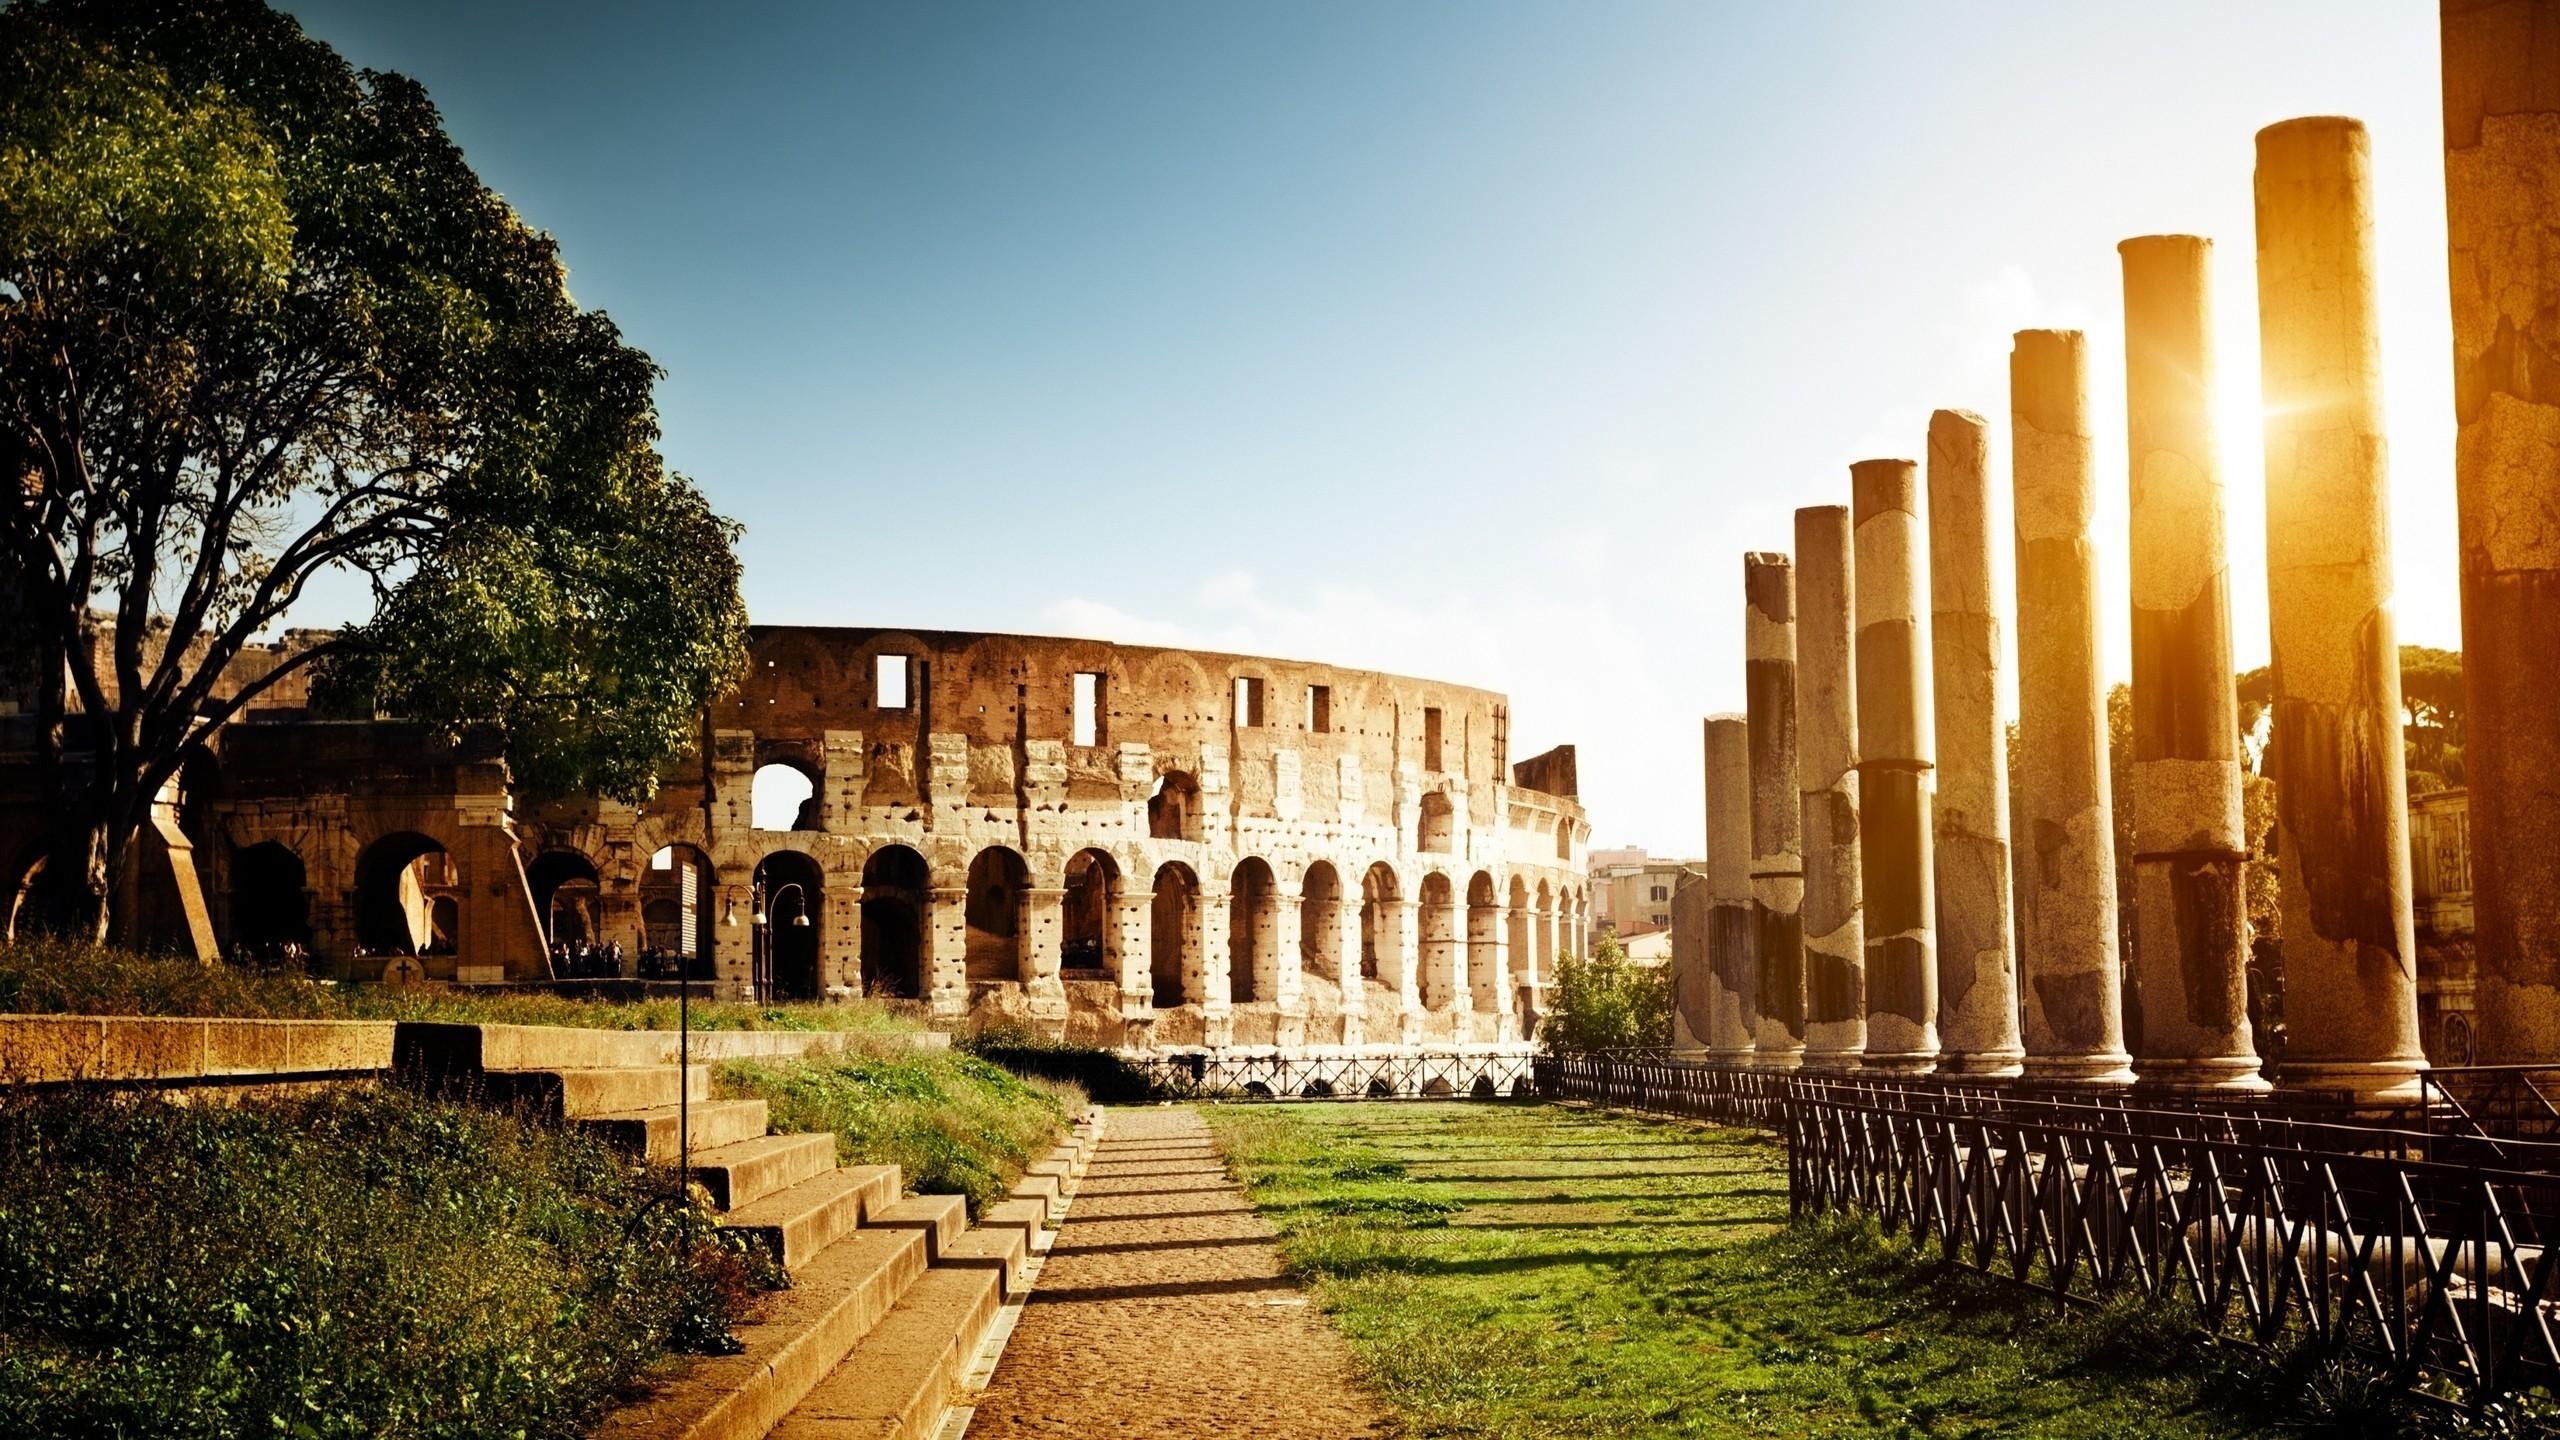 Curso de Italiano Nivel A1 - Prof. Gala - Martes 19 a 21 hs